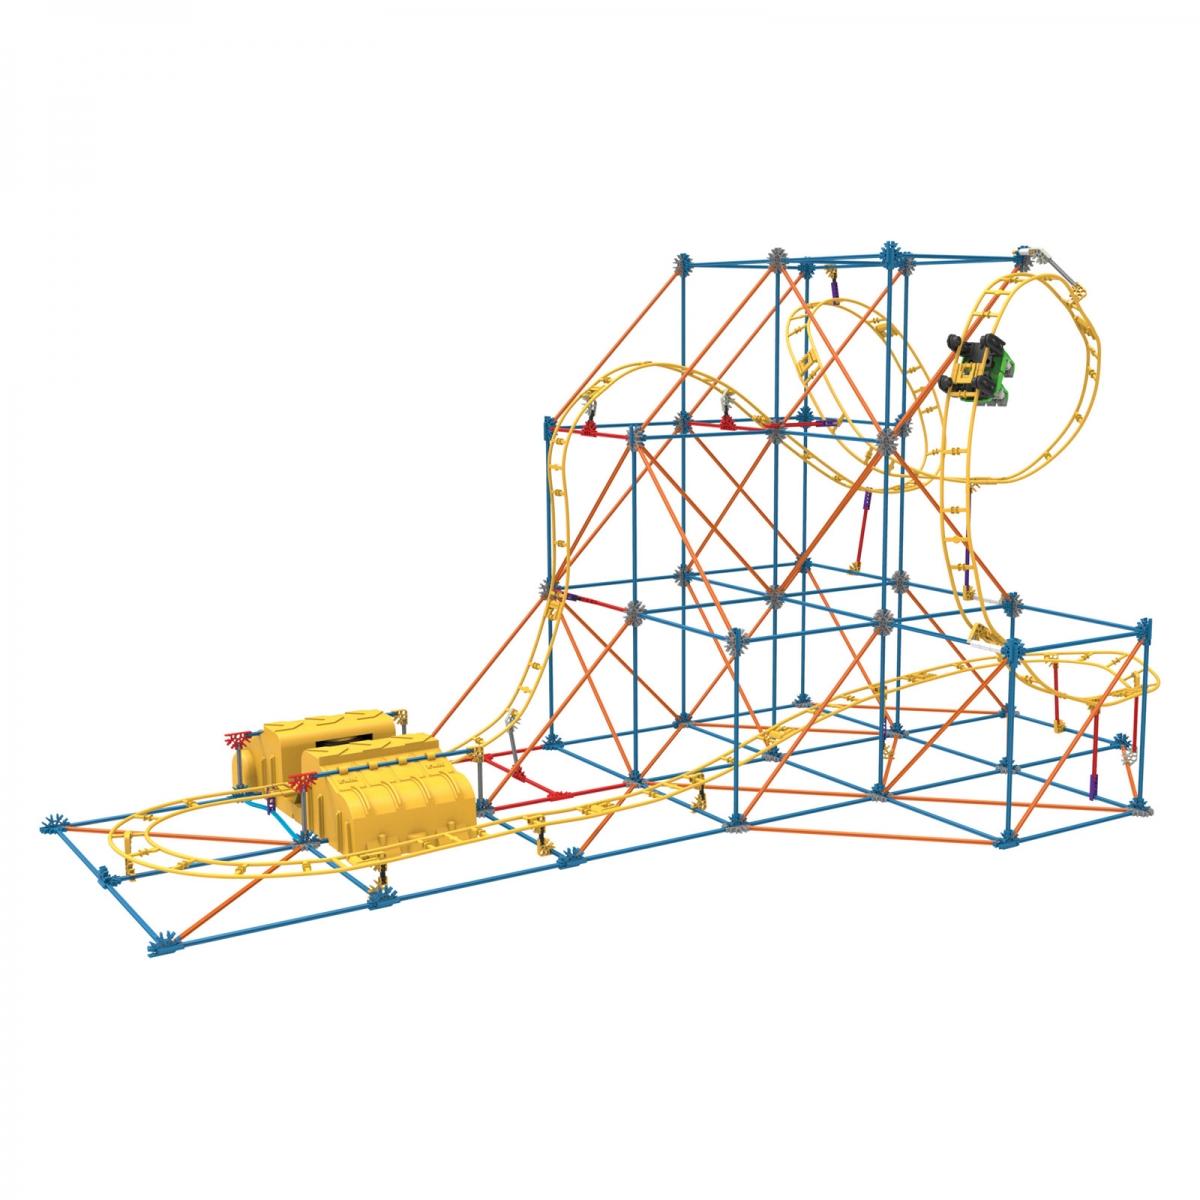 KNEX Hangtime Roller Coaster Building Set KNEX131